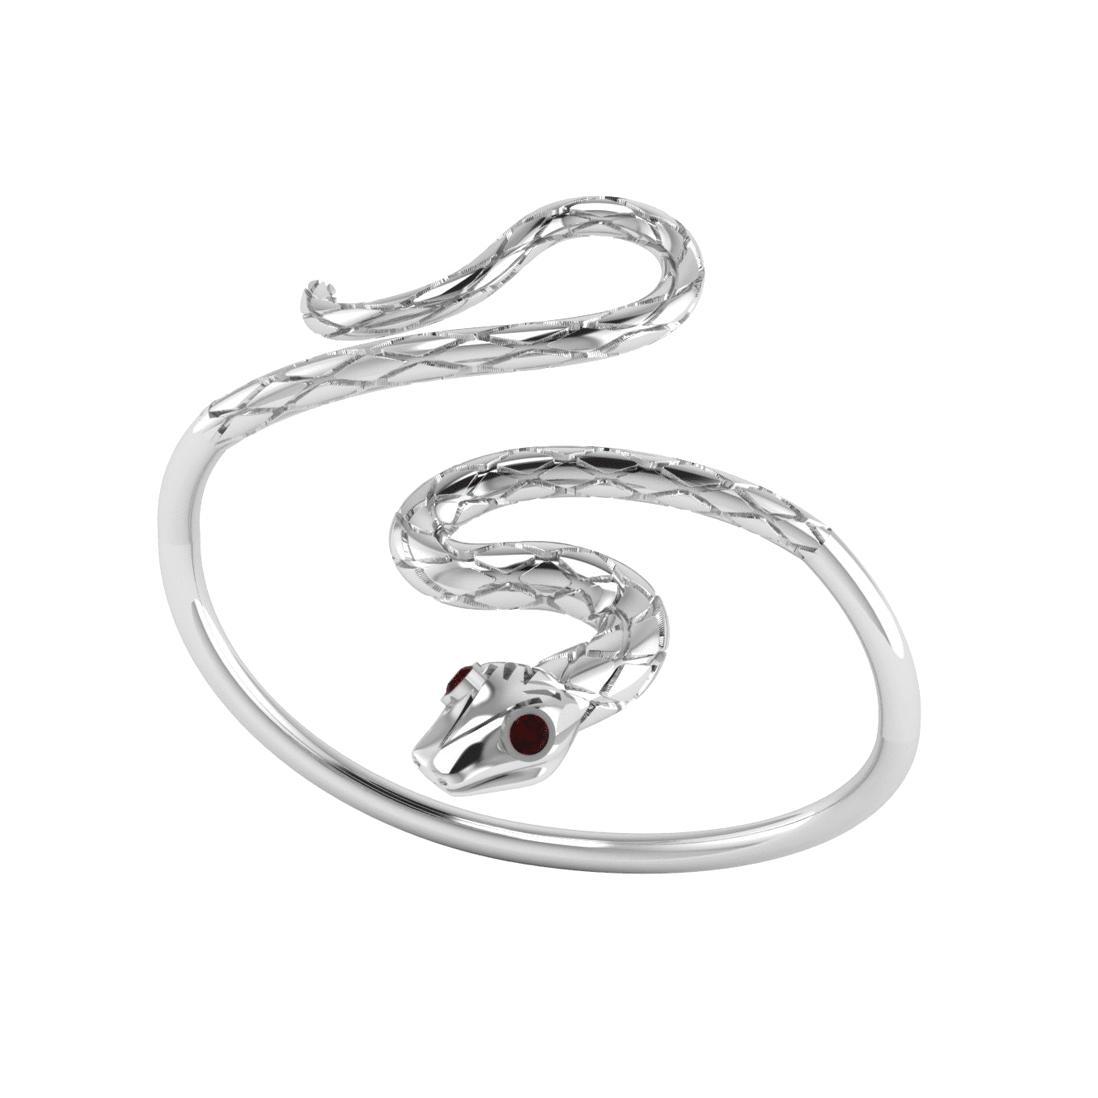 London Road Jewellery Kew Serpent Yellow Gold Ruby Bangle 16Hjs5